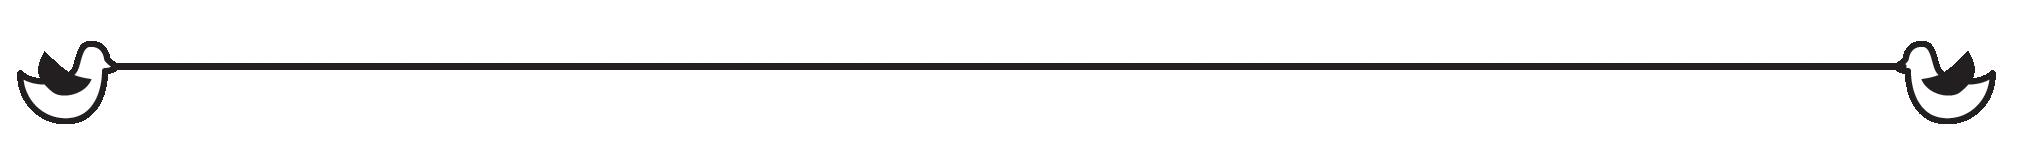 「line 素材 画像」の画像検索結果